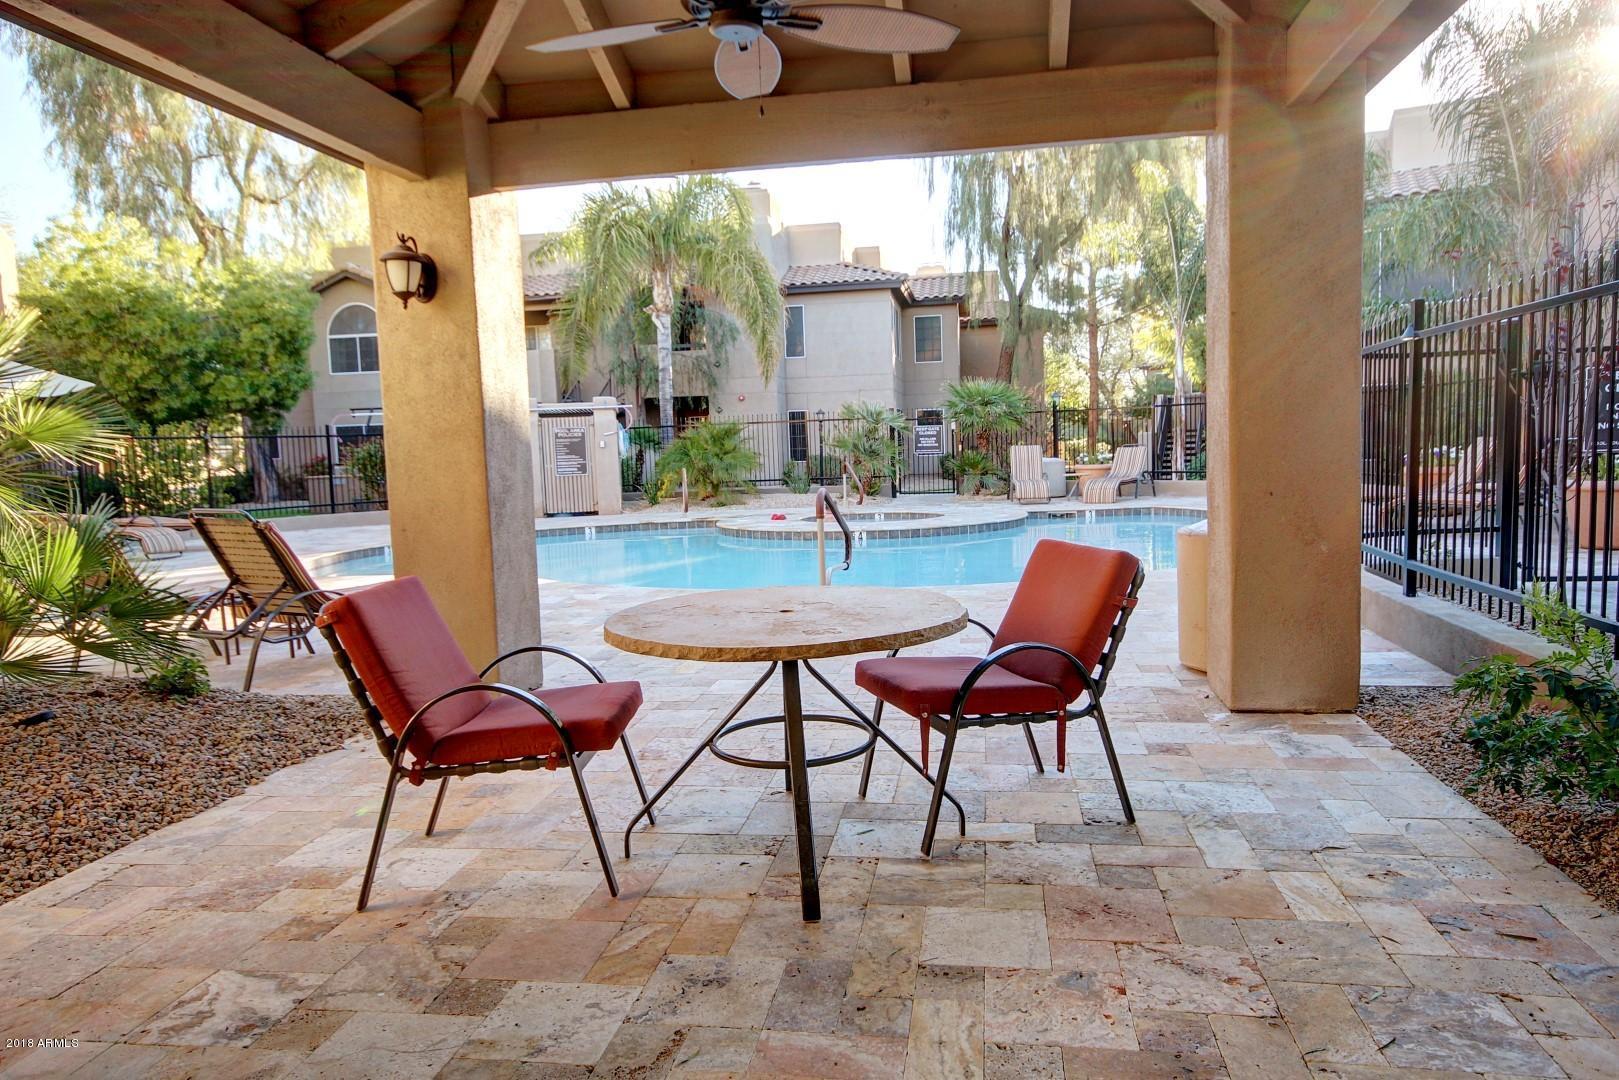 MLS 5862451 9451 E BECKER Lane Unit 1006, Scottsdale, AZ 85260 Scottsdale AZ Private Pool